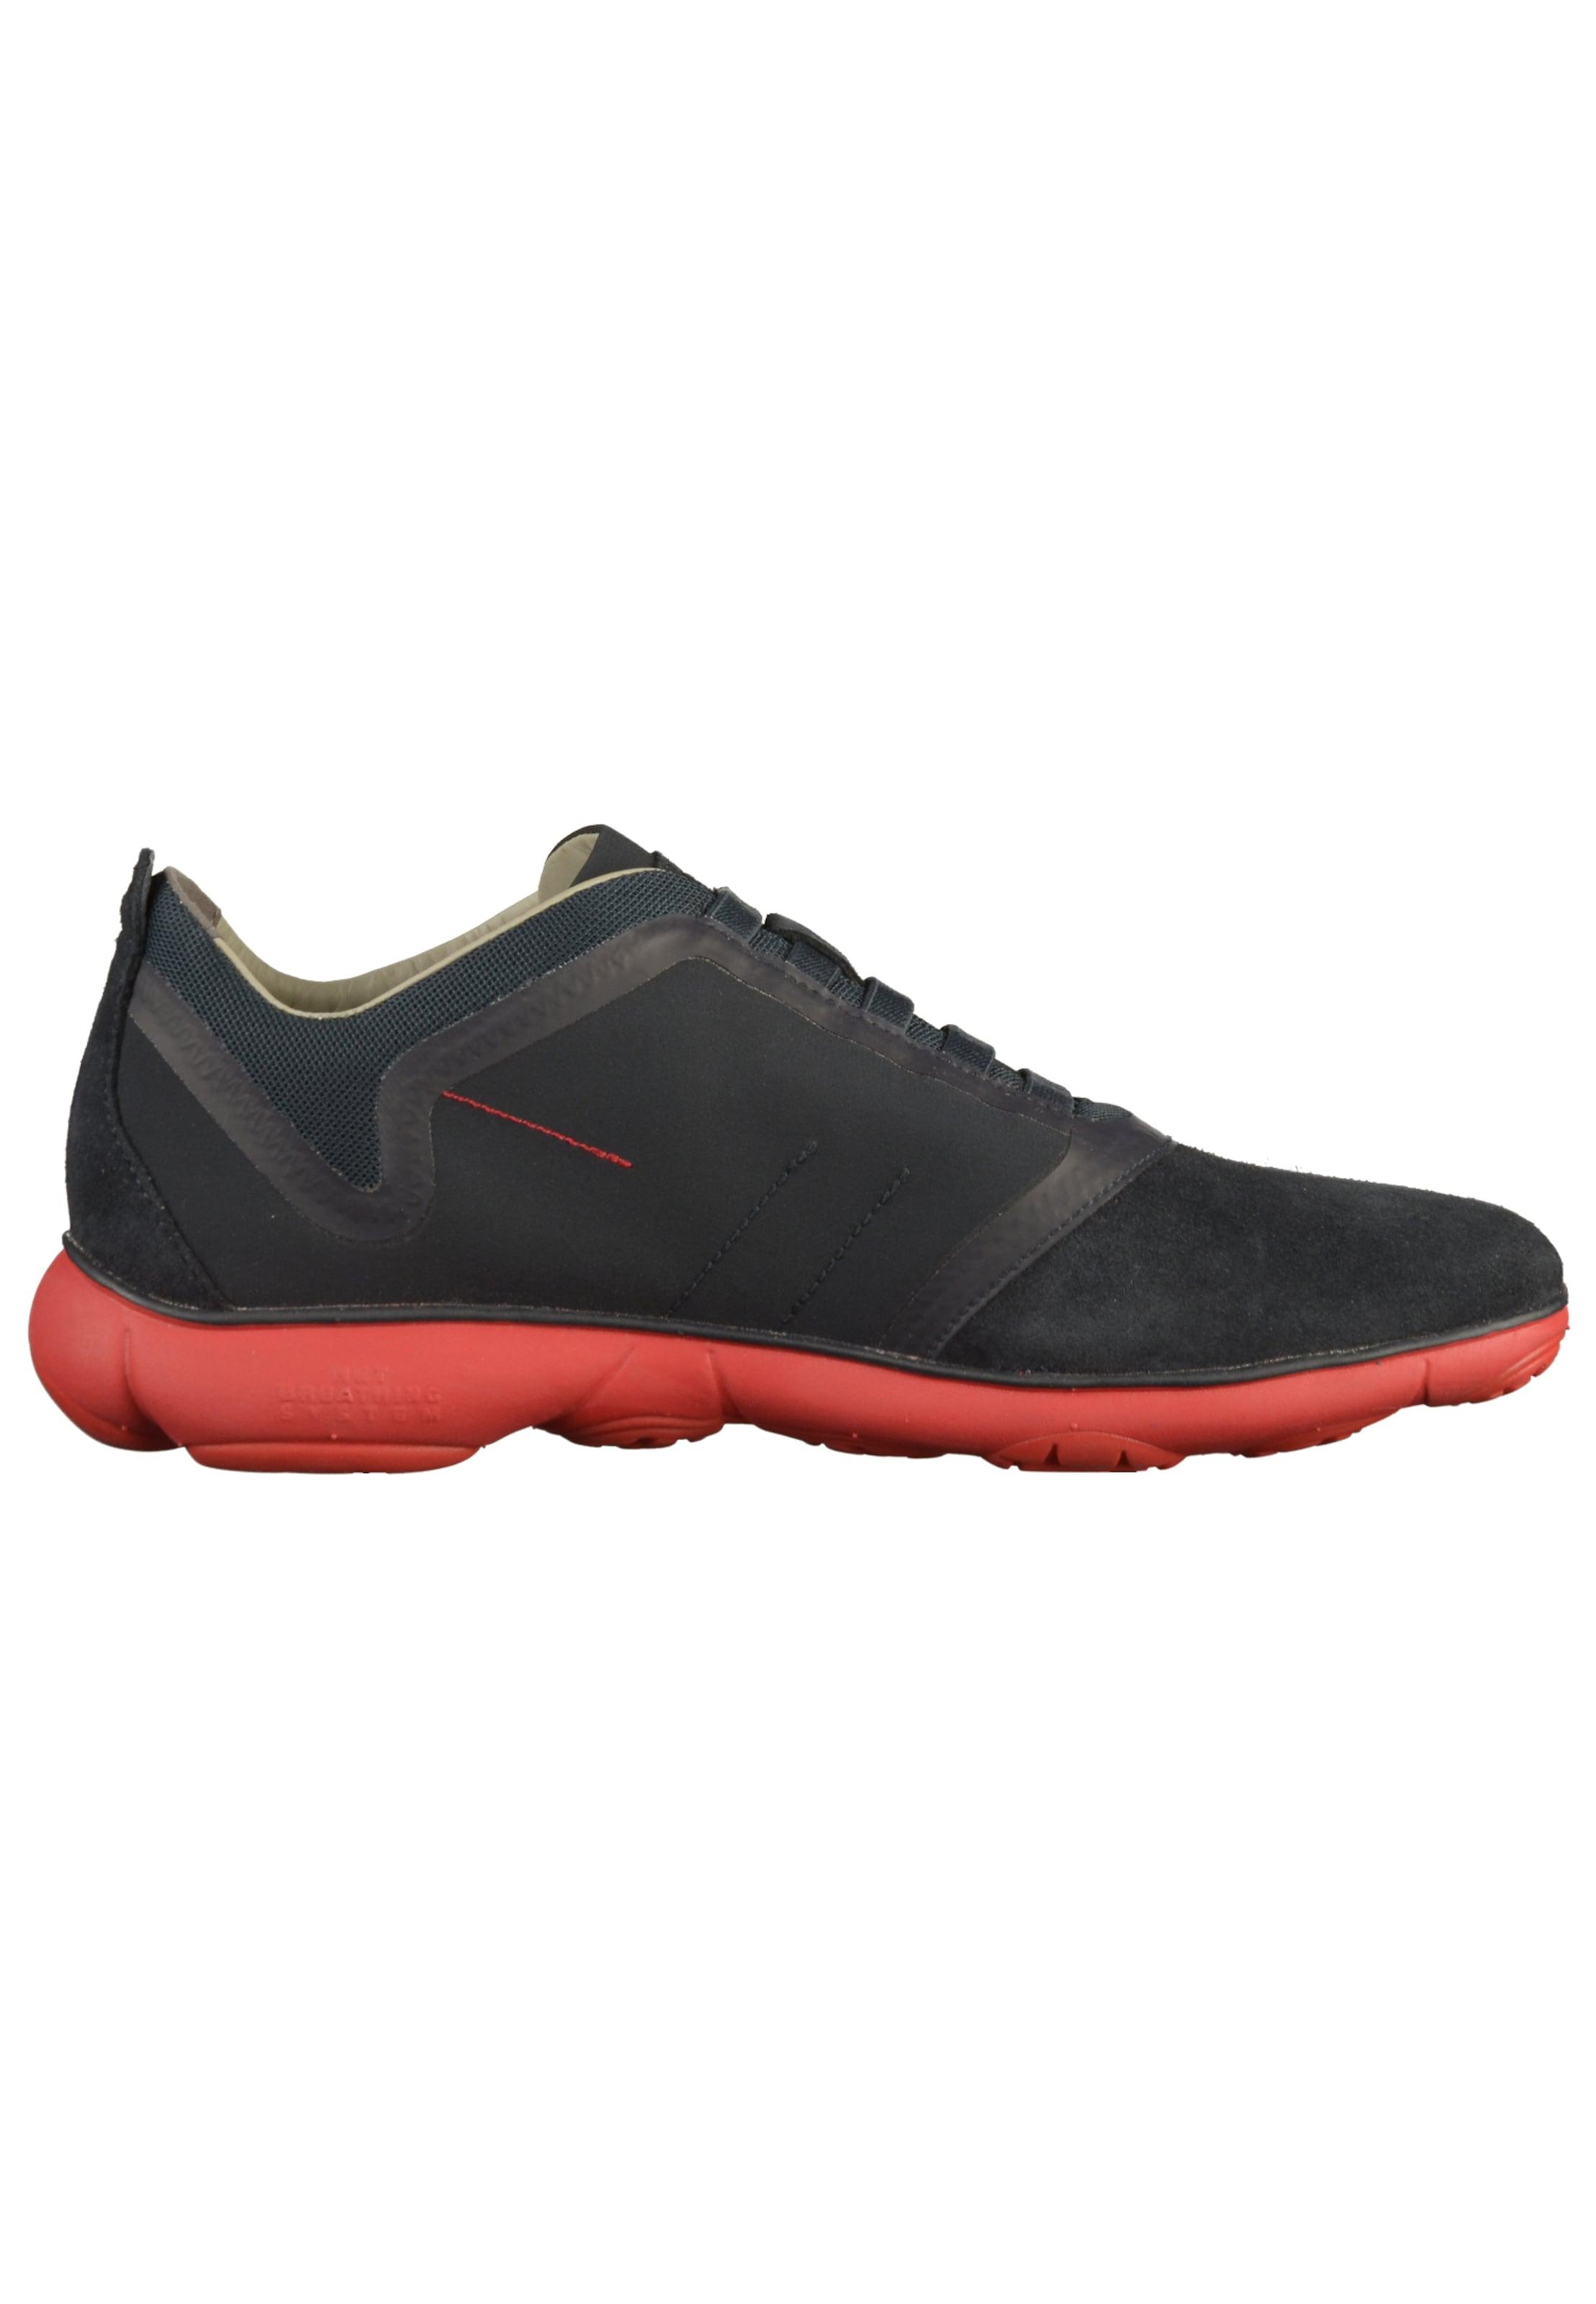 NachtblauRot Sneaker Geox In Sneaker Geox NachtblauRot In rdQCxthsB